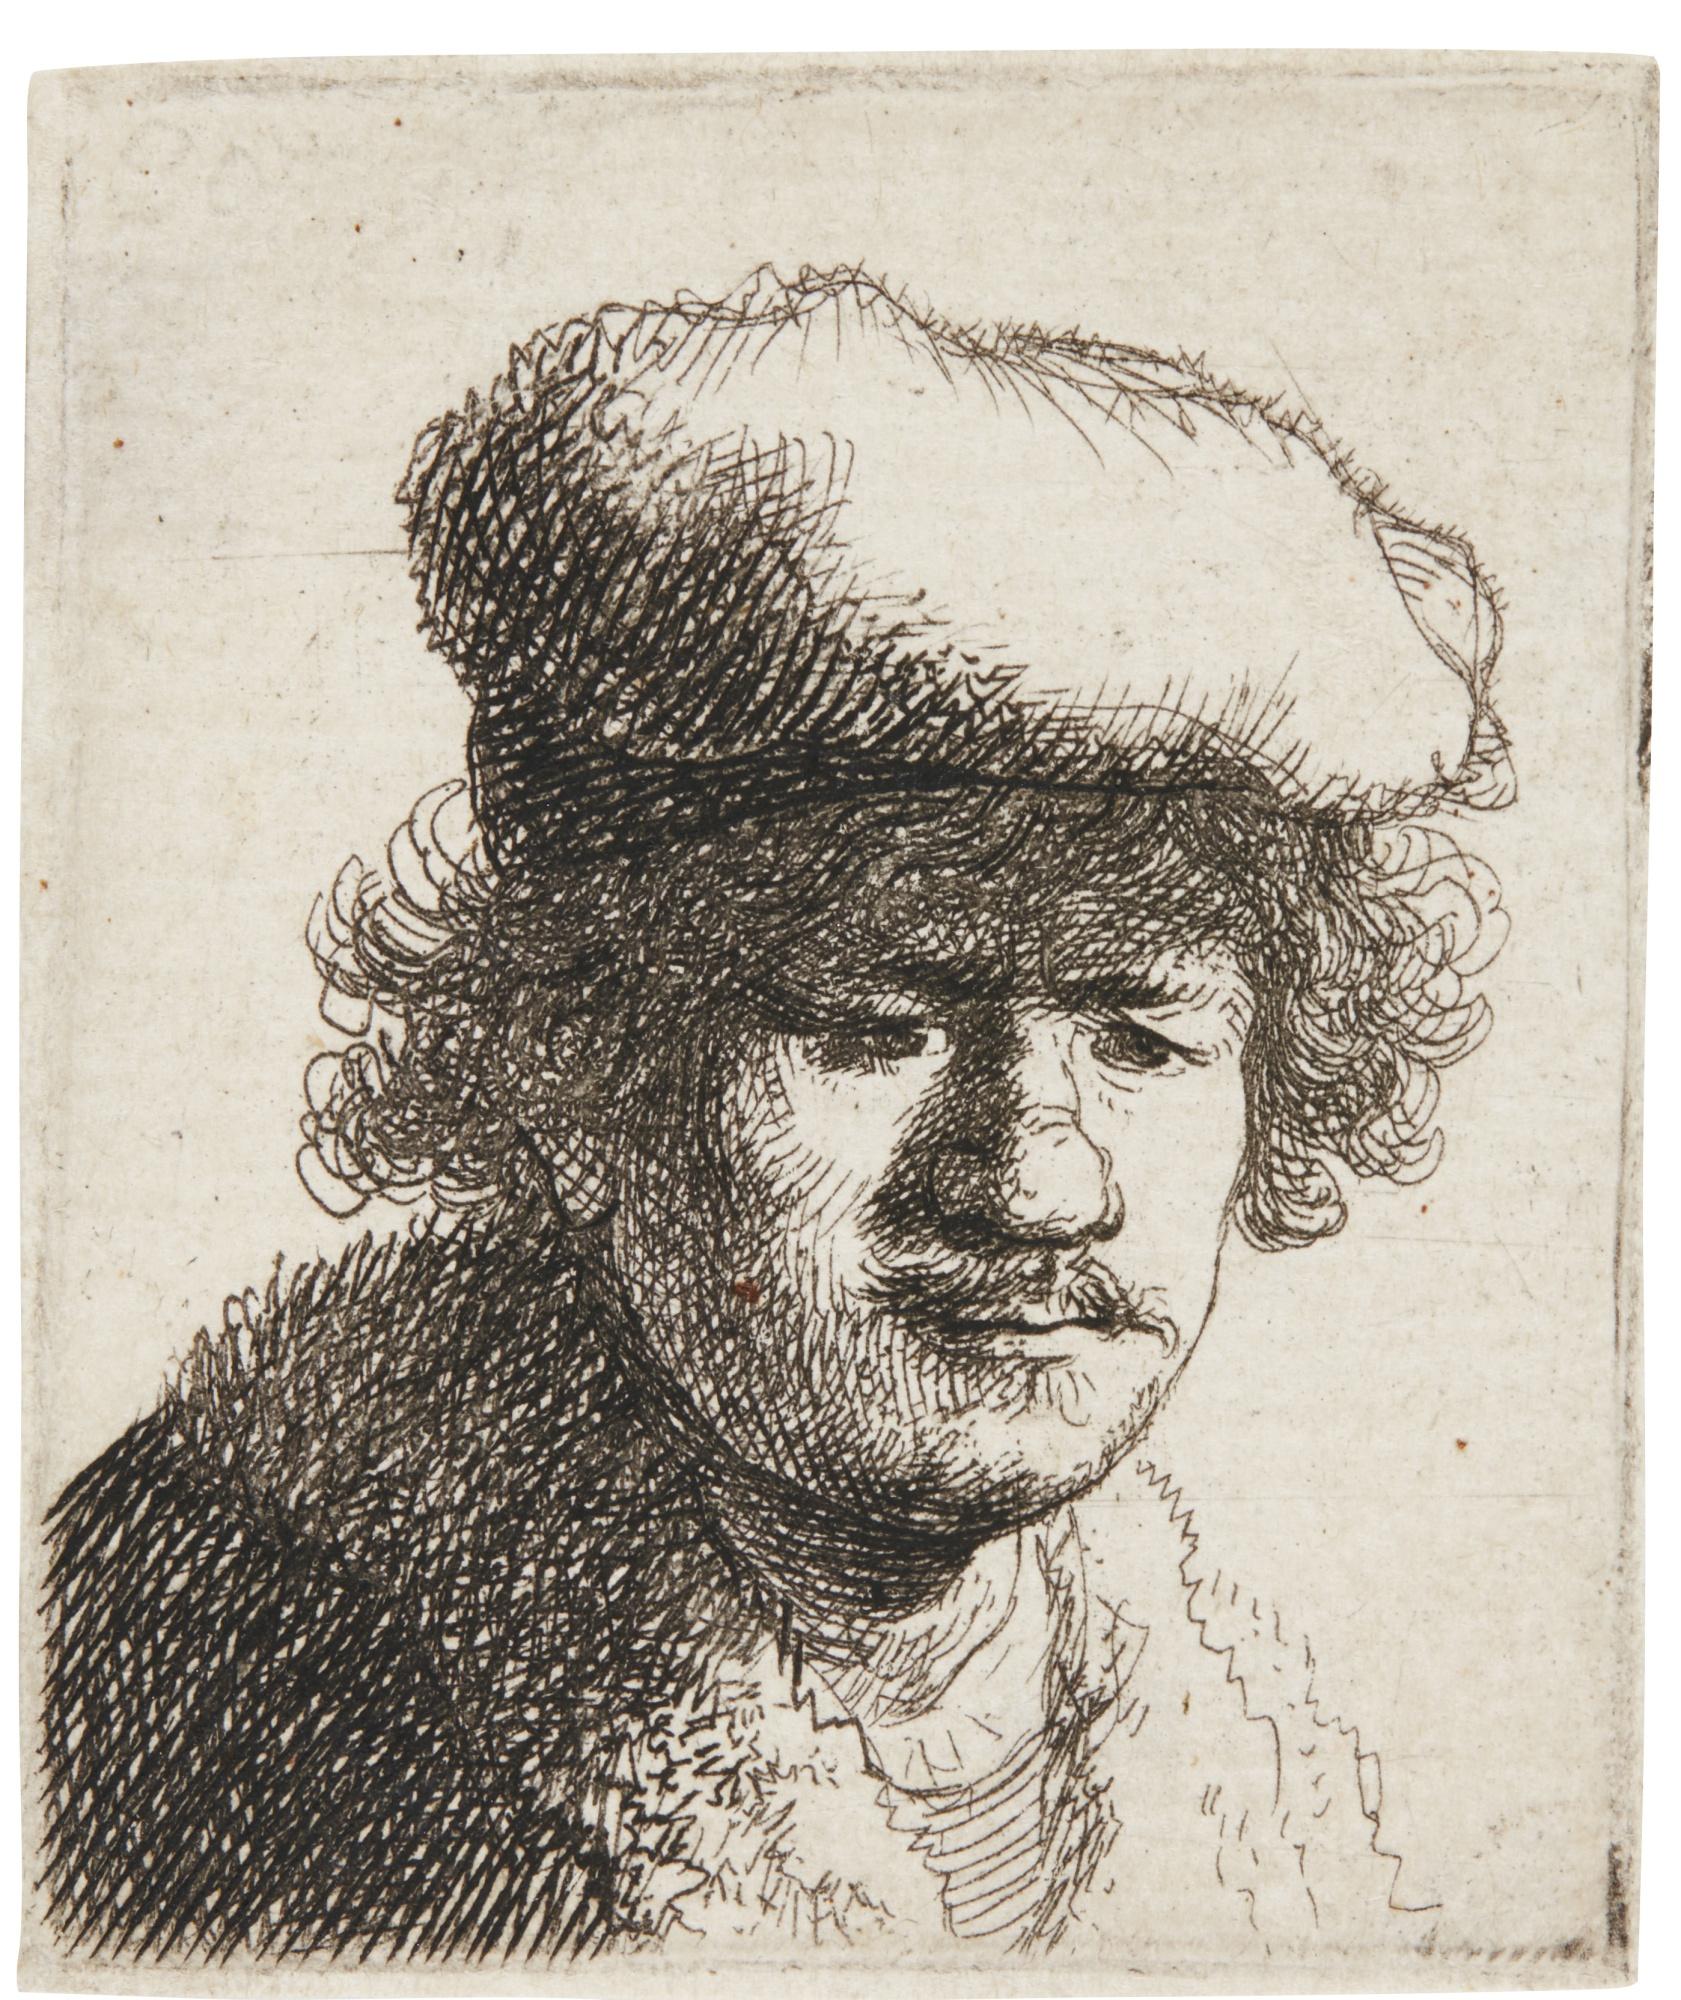 Rembrandt van Rijn-Self-Portrait With Cap Pulled Forward (B., Holl. 319; New Holl. 71; H. 58)-1630